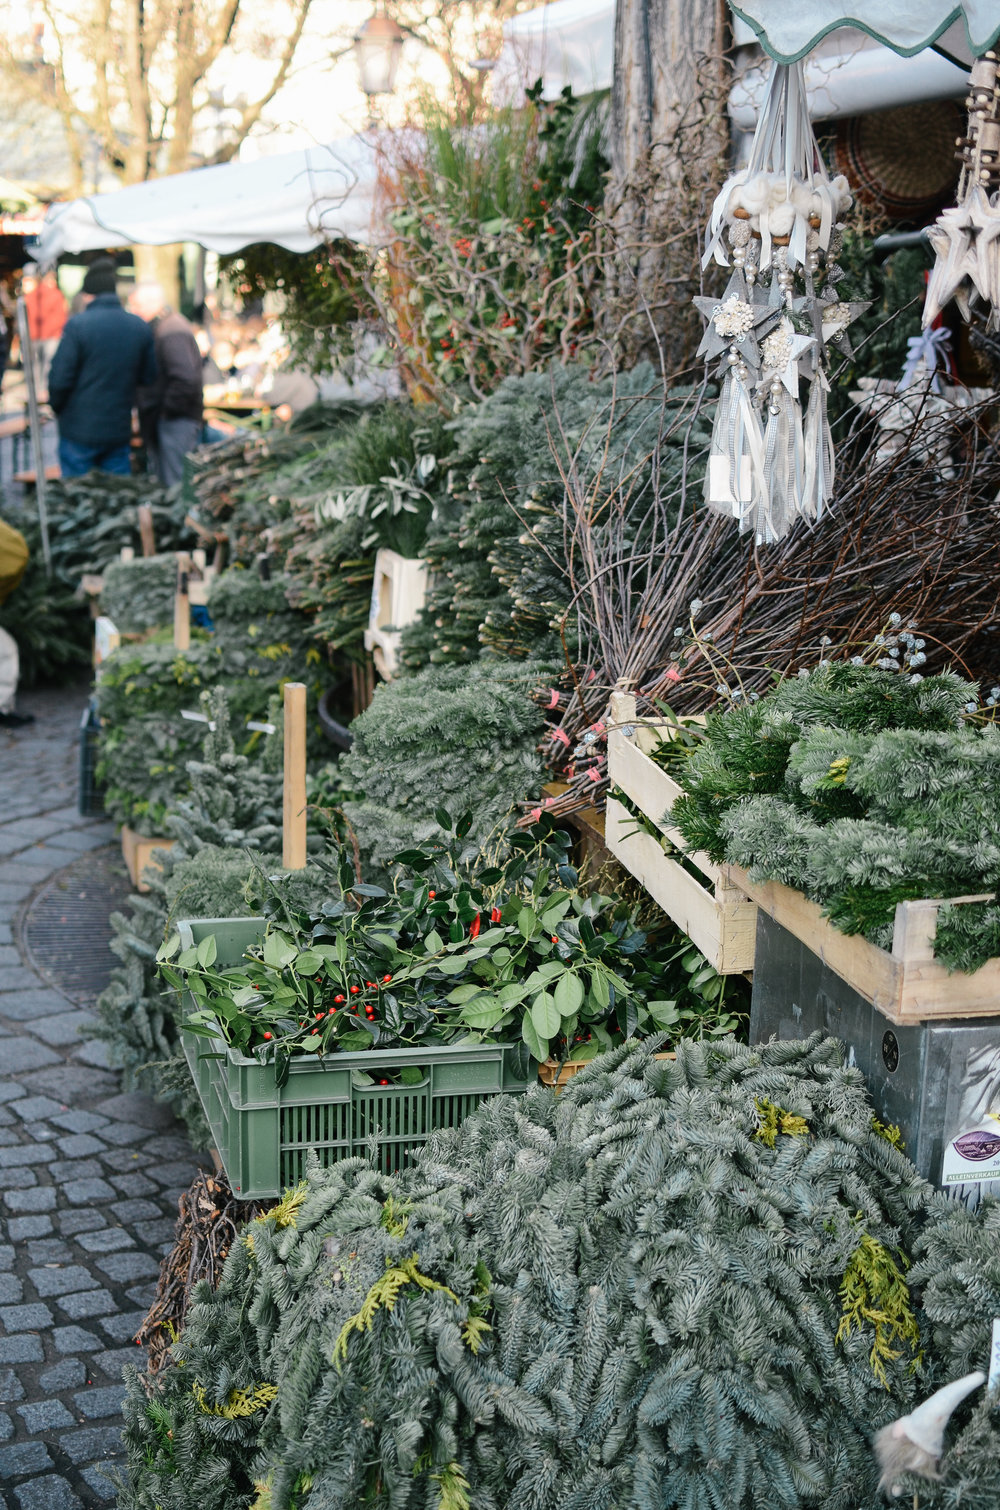 european-christmas-market-travel-guide-lifeonpine_DSC_0215.jpg